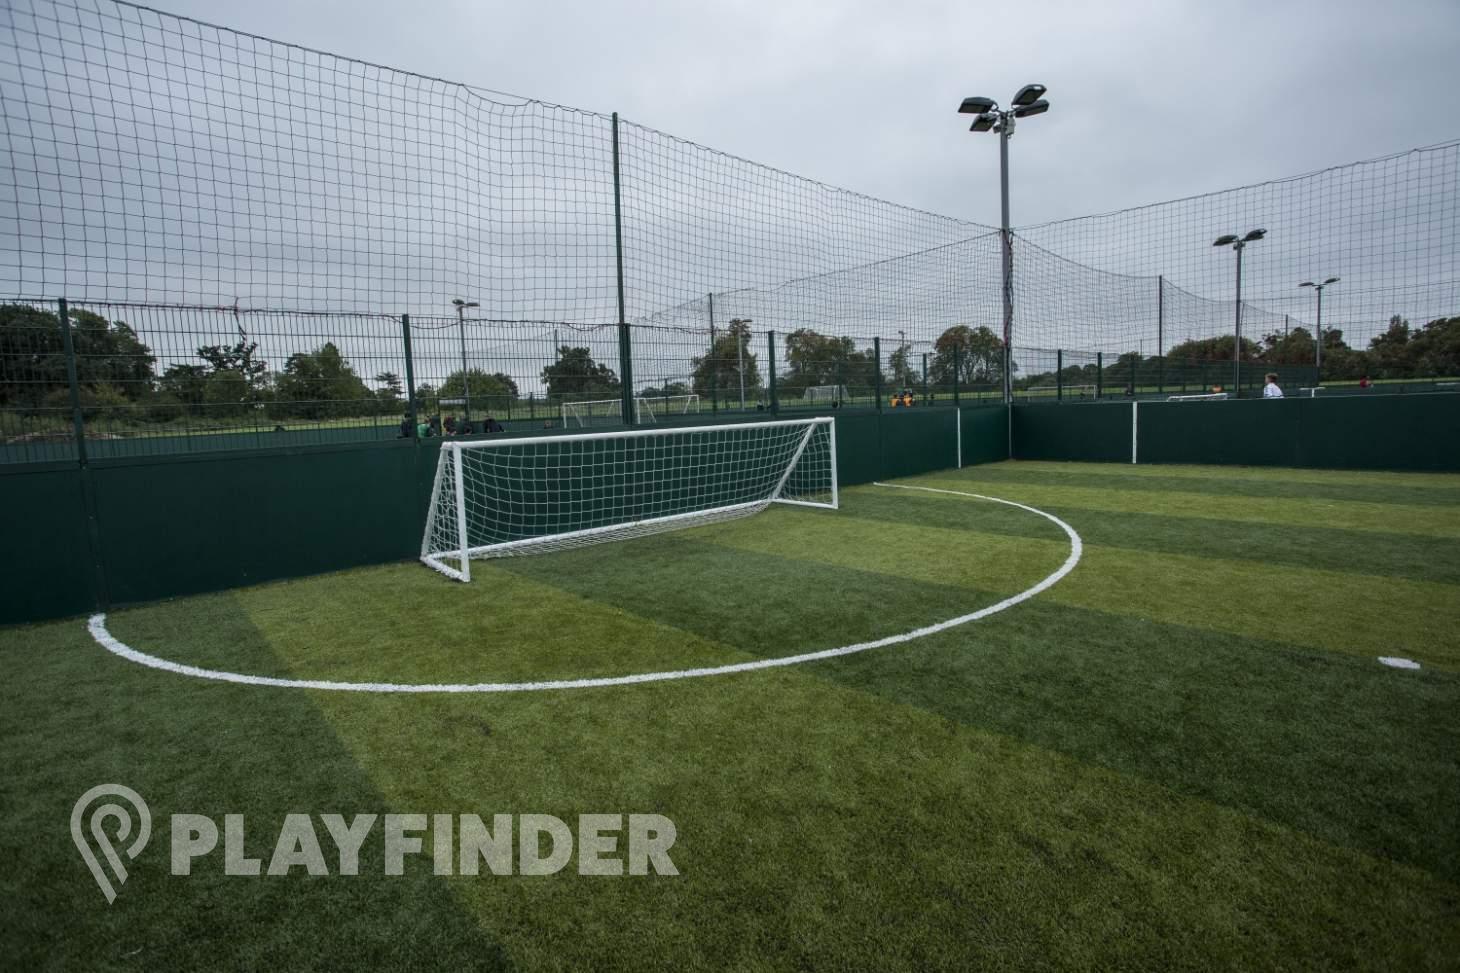 Powerleague Portobello 5 a side | 3G Astroturf football pitch